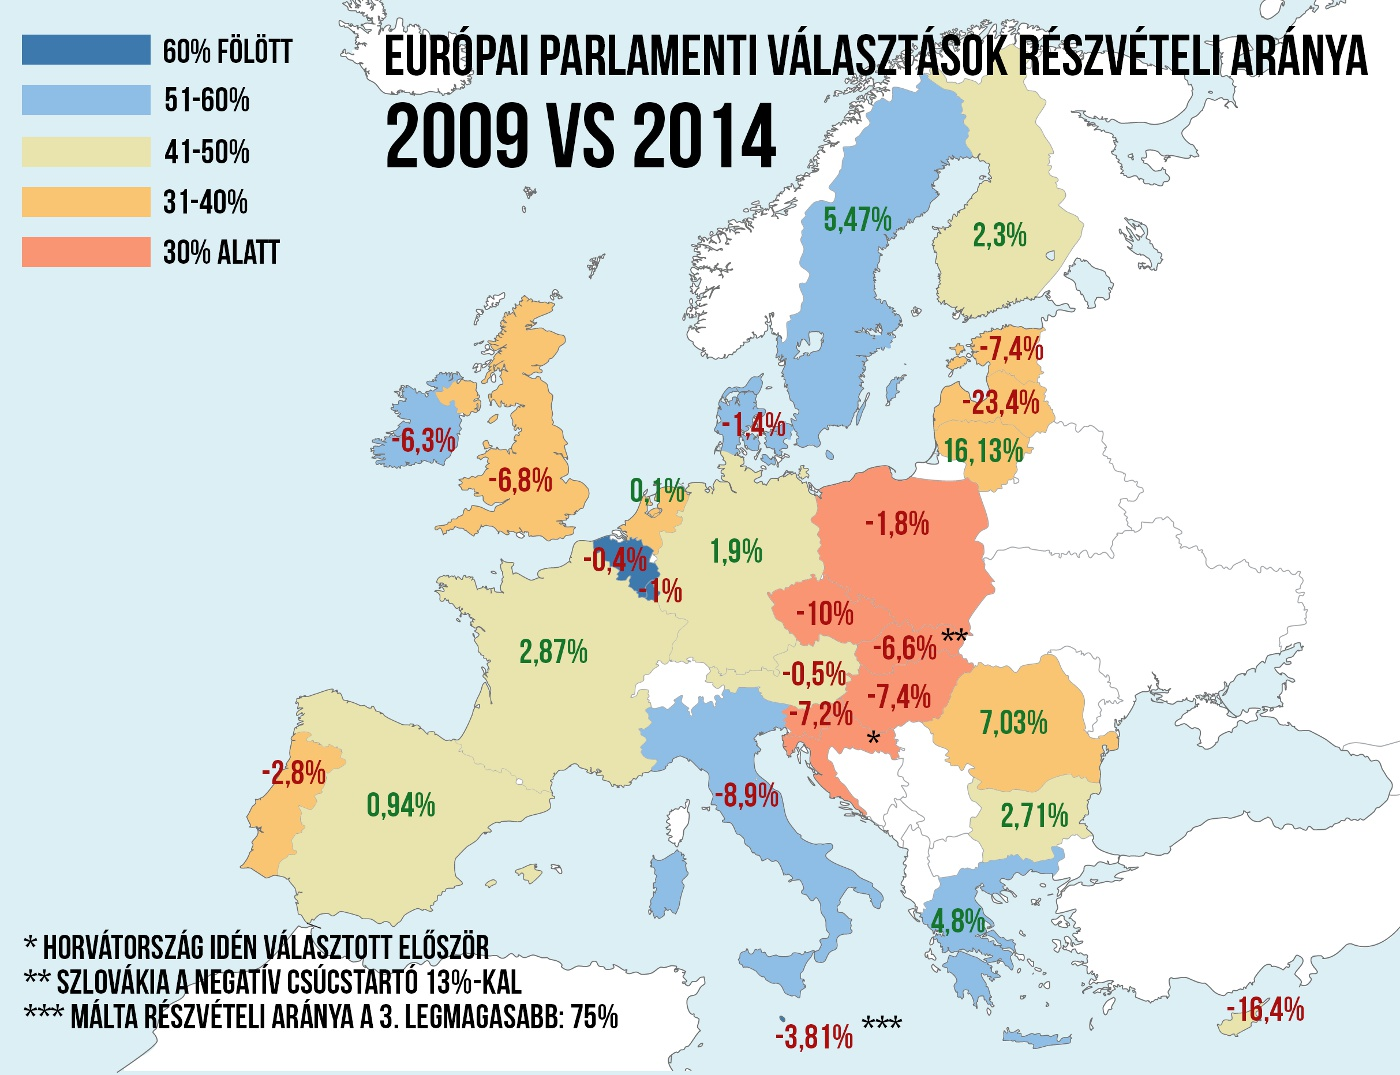 Europai Parlamenti Valasztasok Reszveteli Aranya 2014